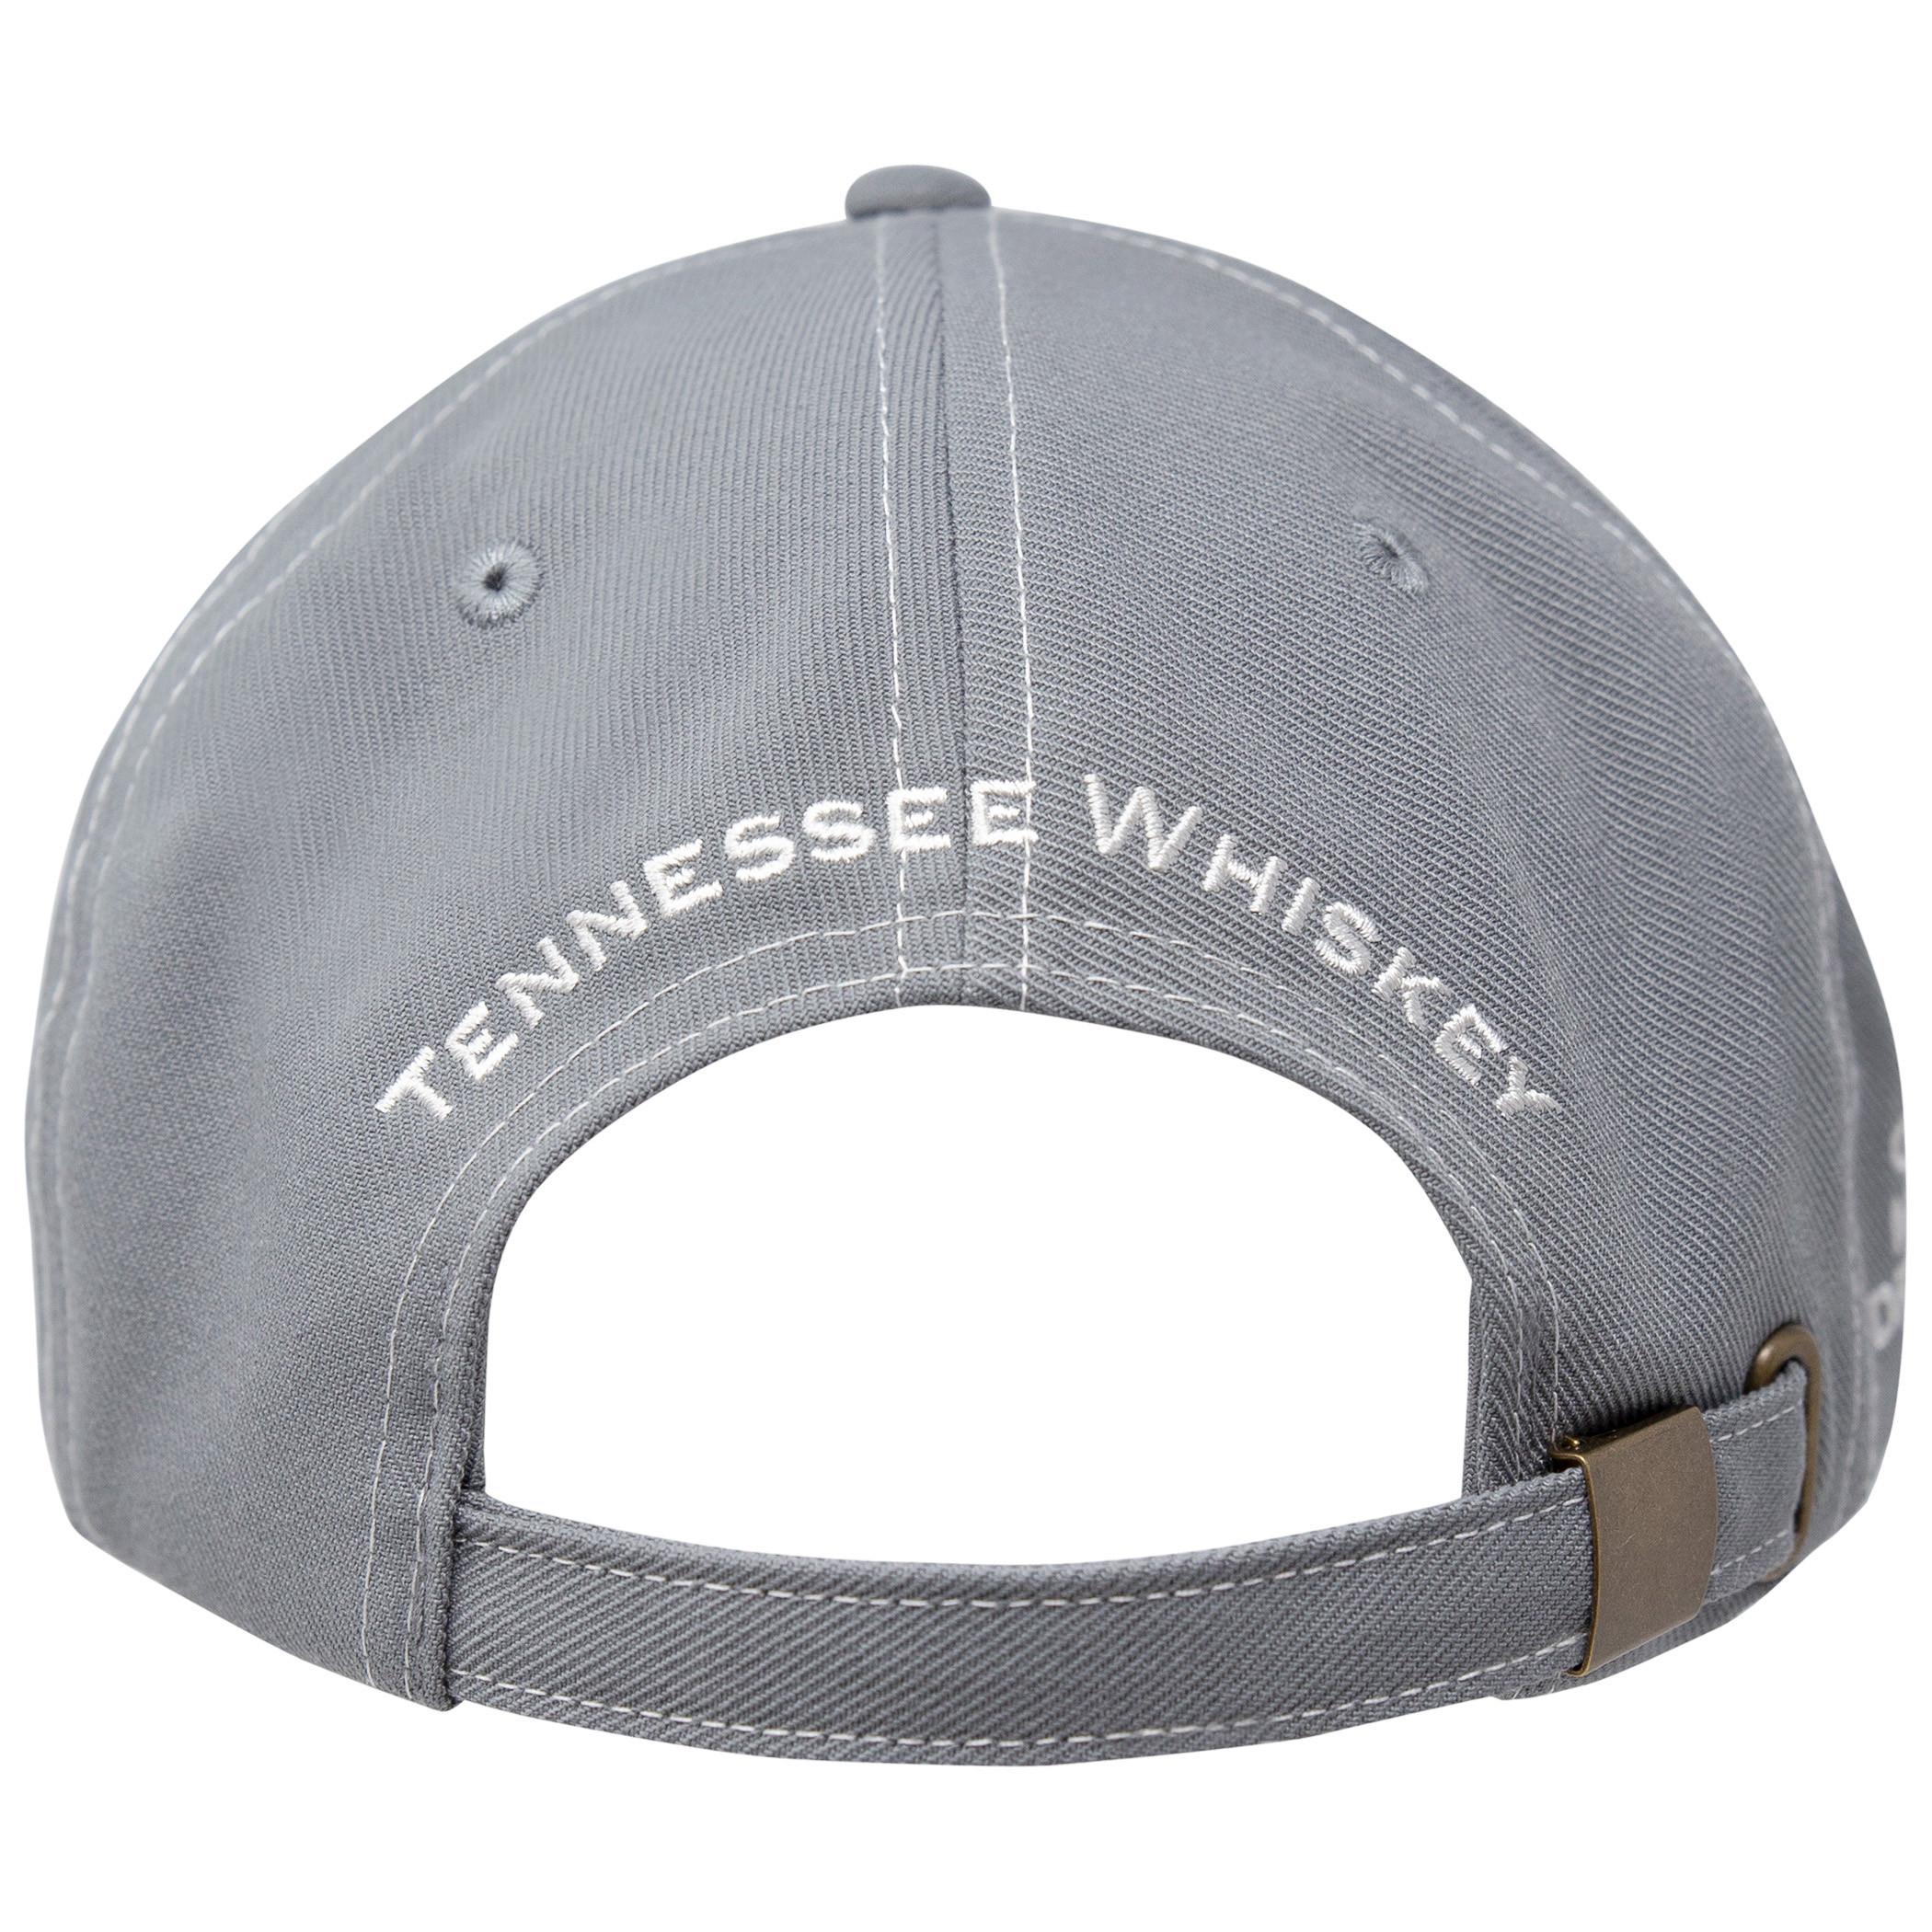 Jack Daniels Contrast Stitching Grey Hat